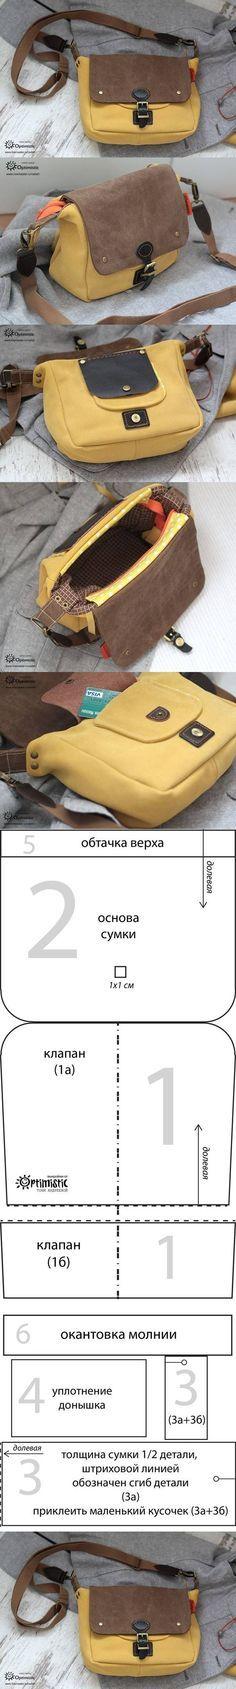 DIY Sew Handbag Pattern DIY Projects | UsefulDIY.com Follow Us on Facebook ==> http://www.facebook.com/UsefulDiy